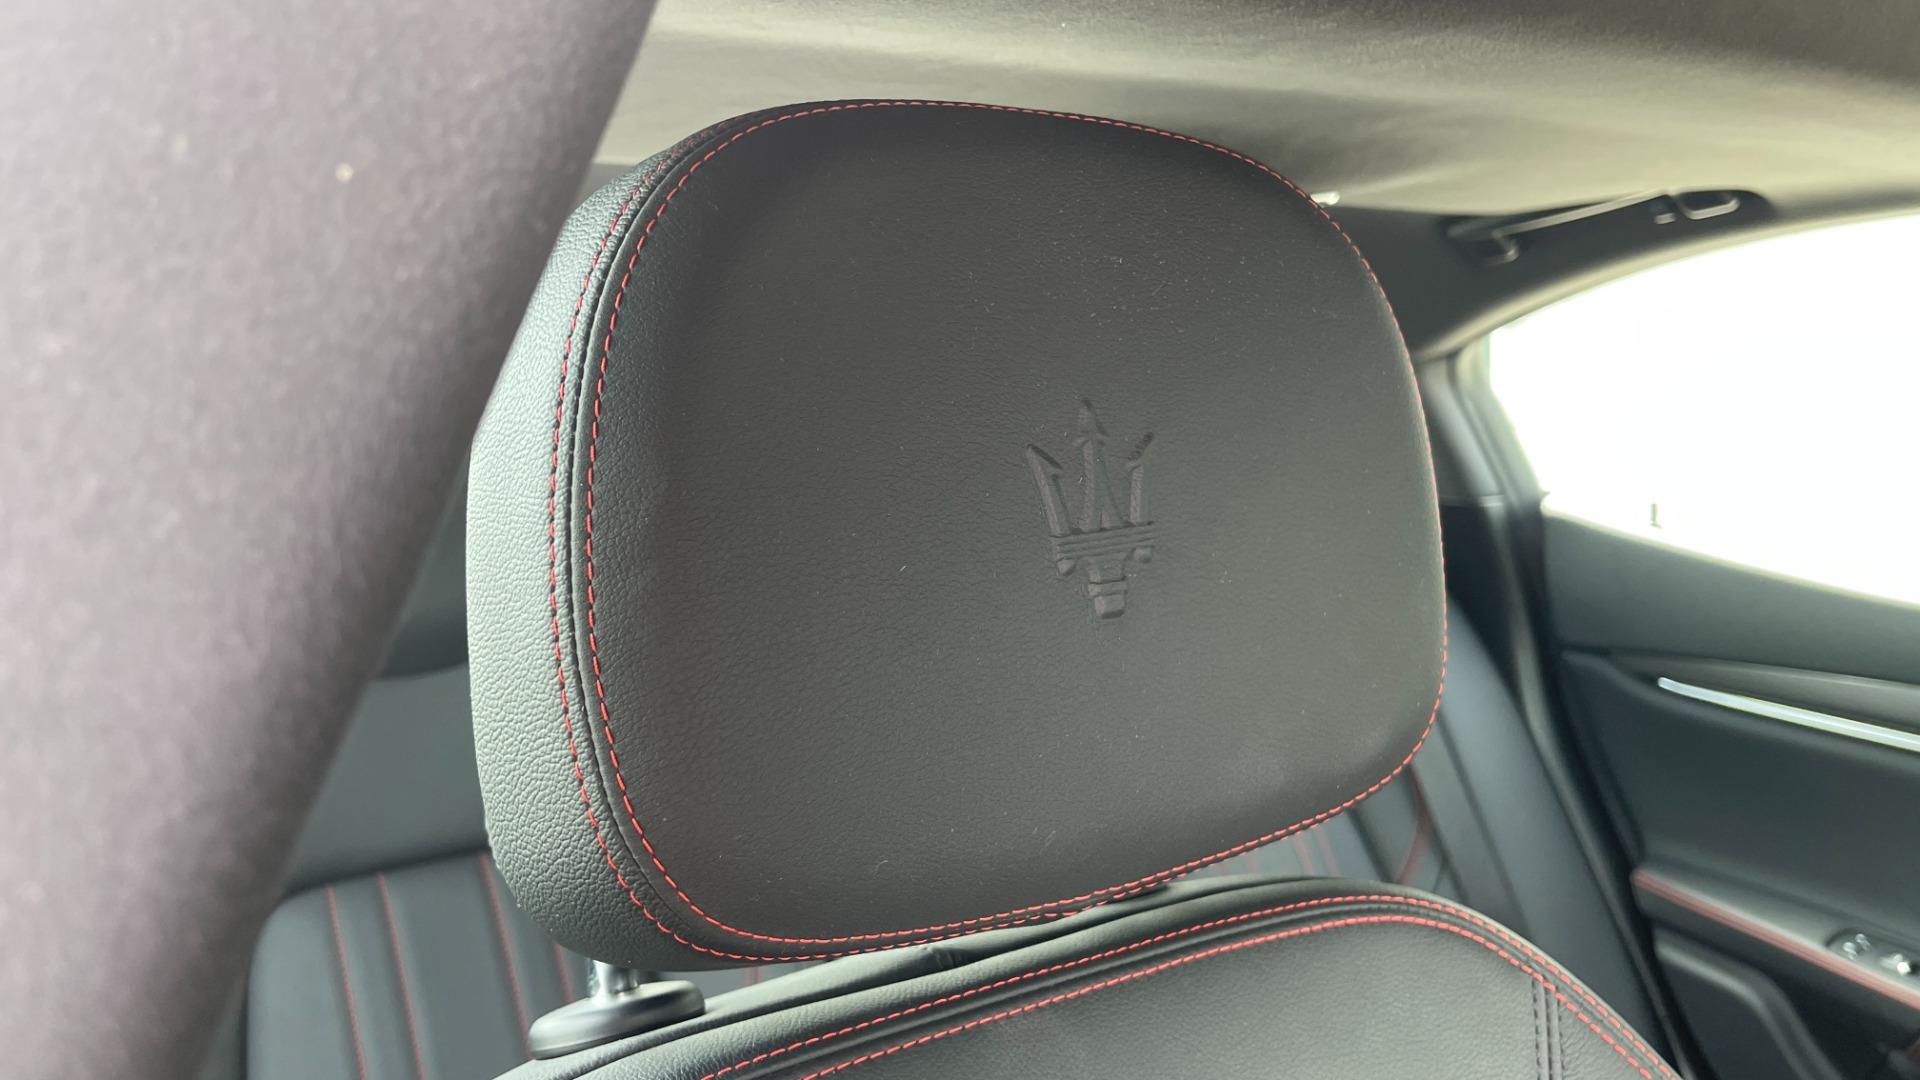 Used 2018 Maserati GHIBLI S Q4 SEDAN / AWD / 3.0L V6 / SUNROOF / NAV / REARVIEW for sale $51,995 at Formula Imports in Charlotte NC 28227 65